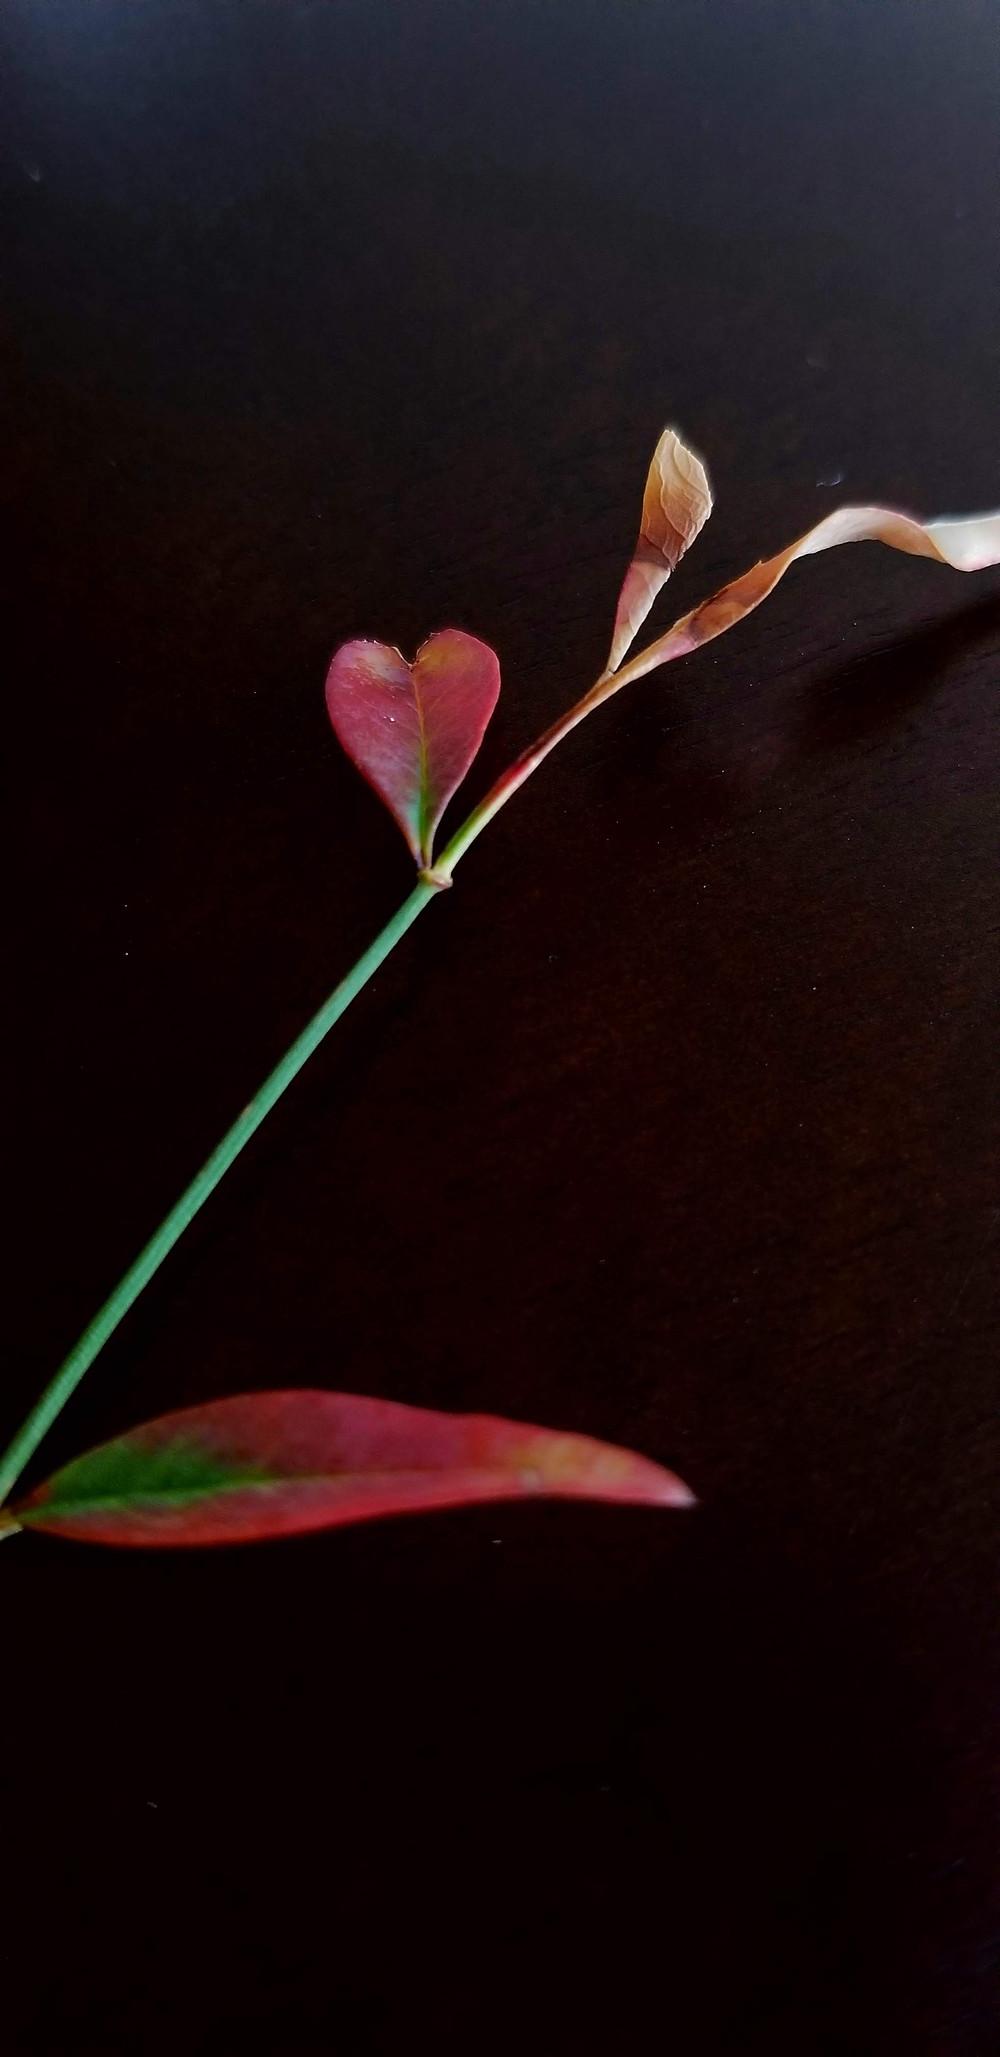 heart-shaped leaf plant stem